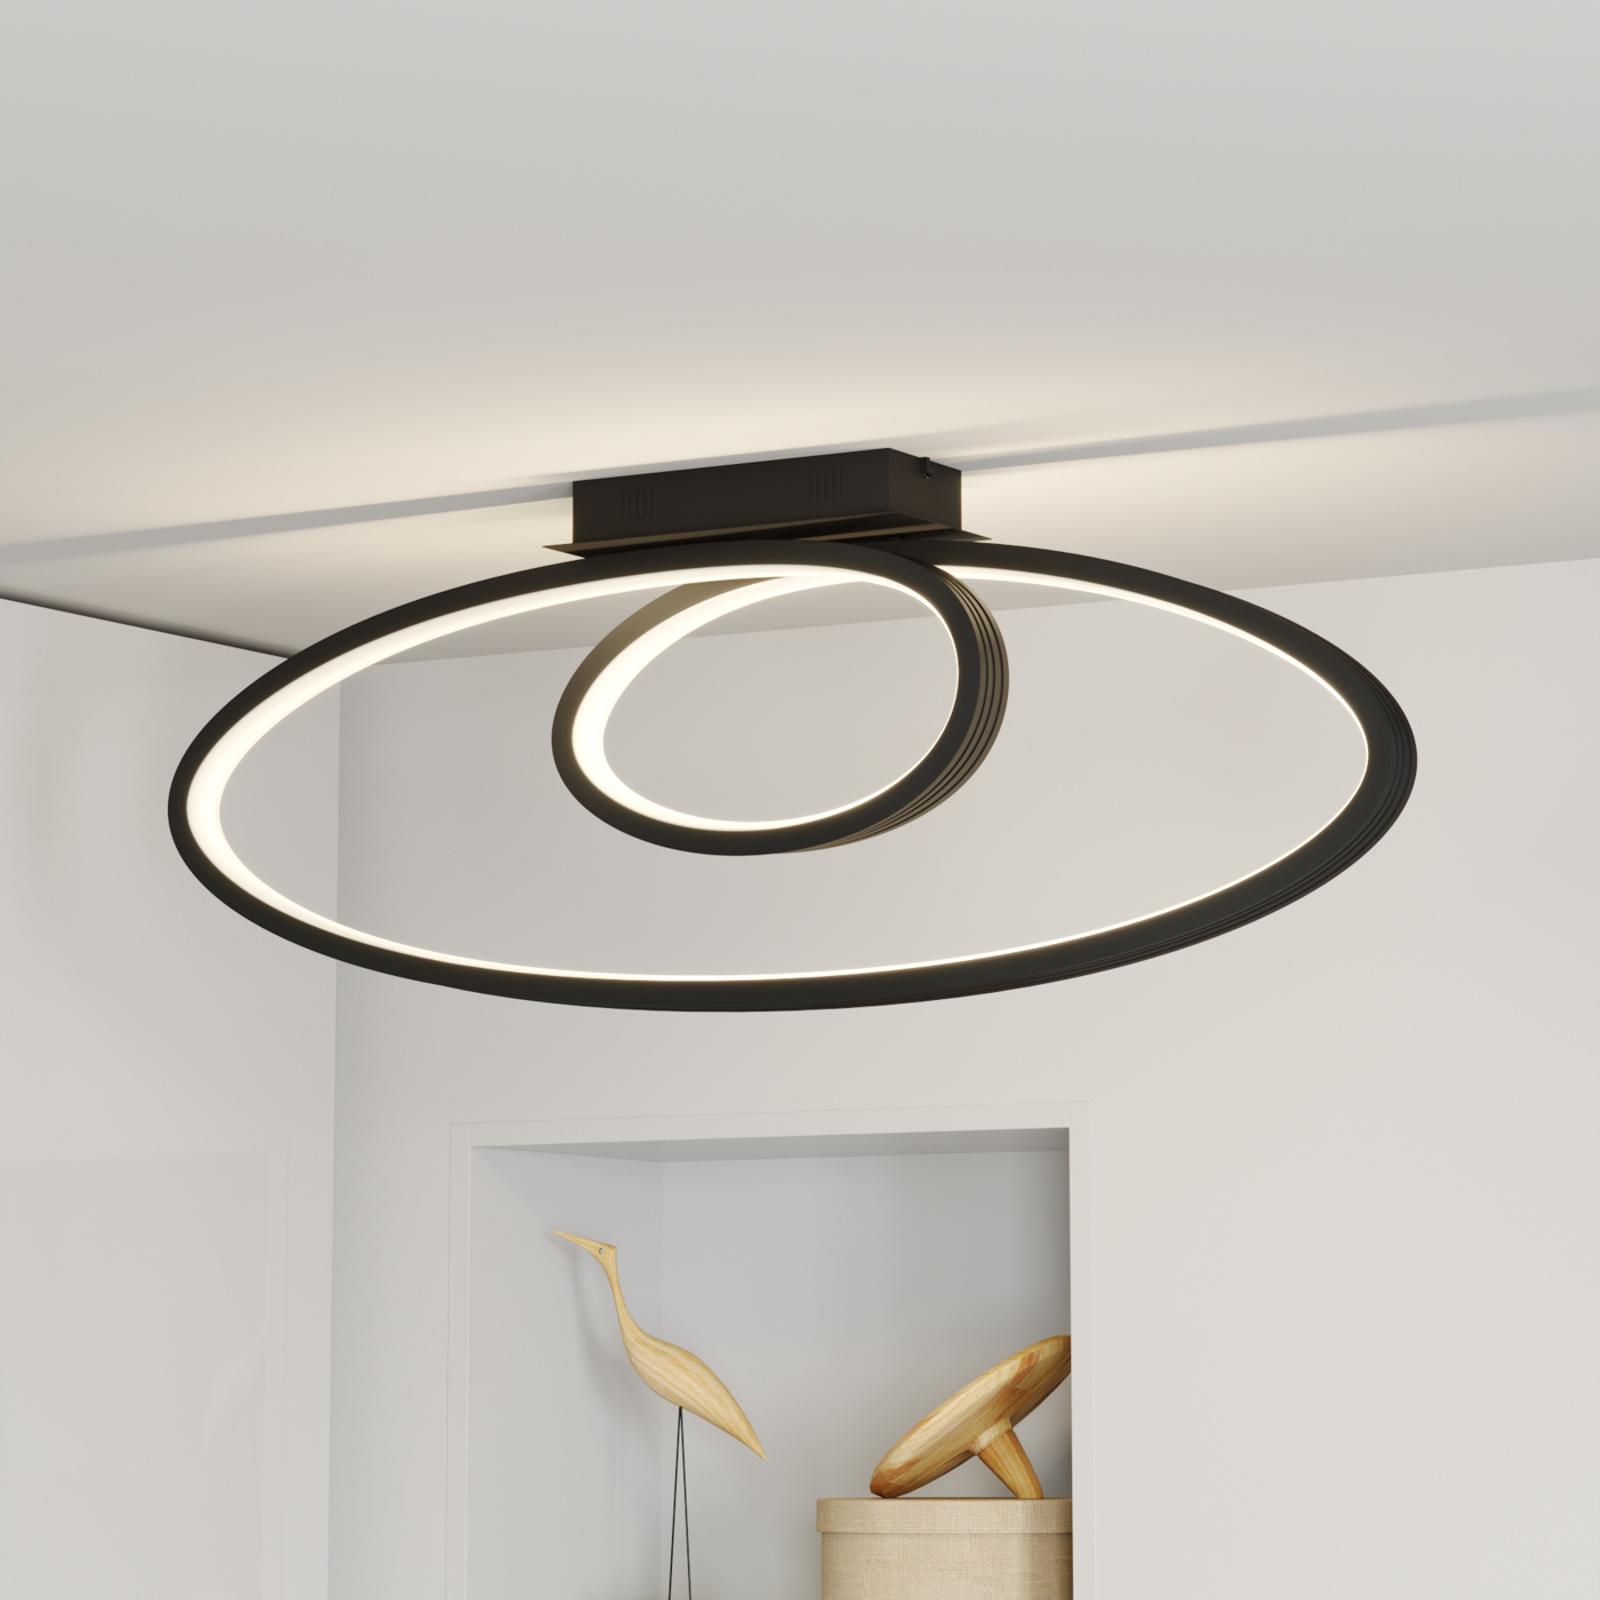 Lucande Bronwyn lampa sufitowa LED, 98 cm